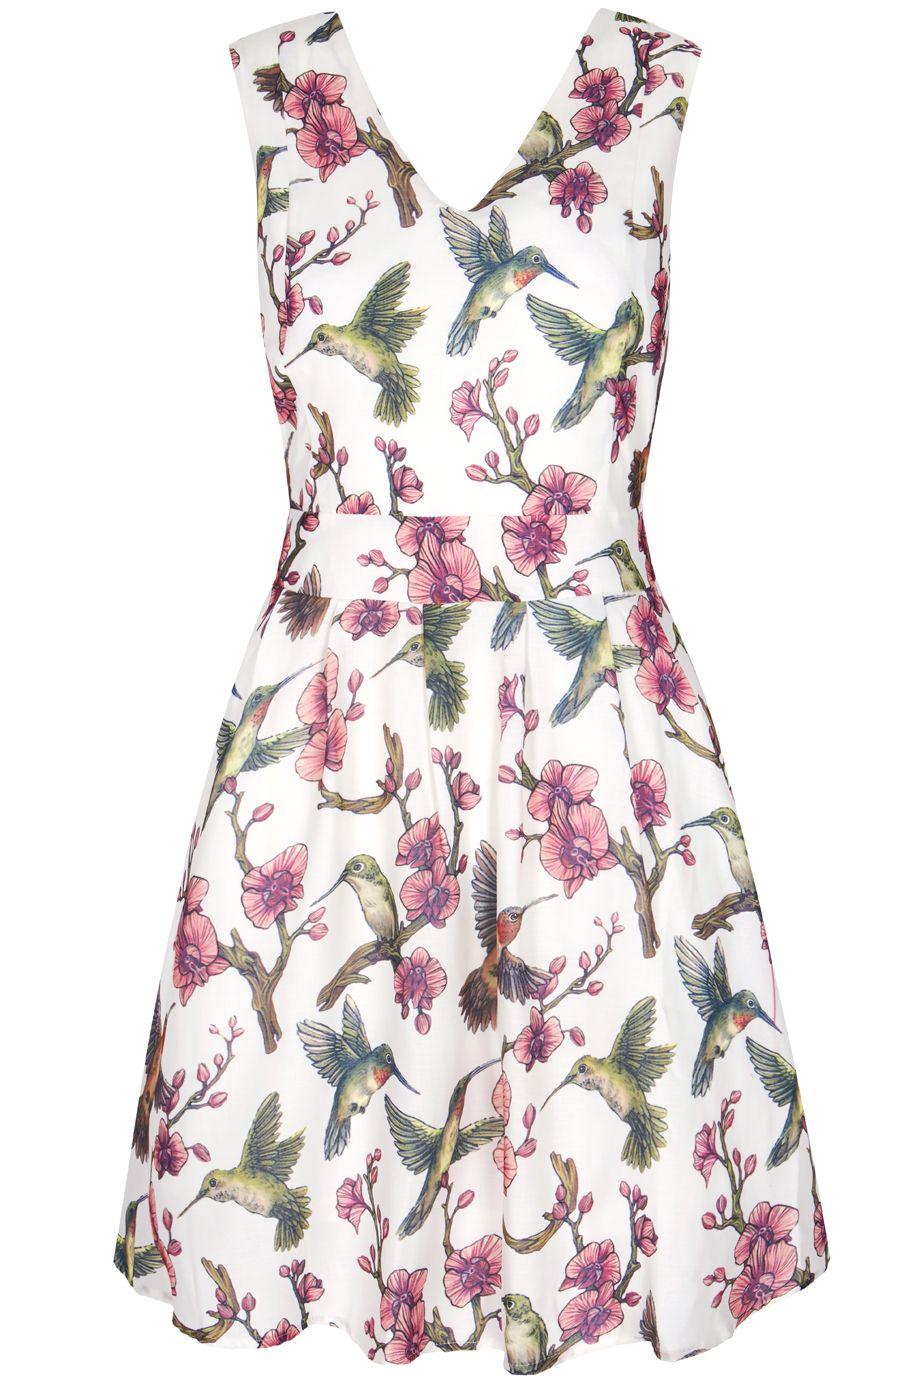 b2dba3a37060 Λευκό floral φόρεμα με πουλάκια